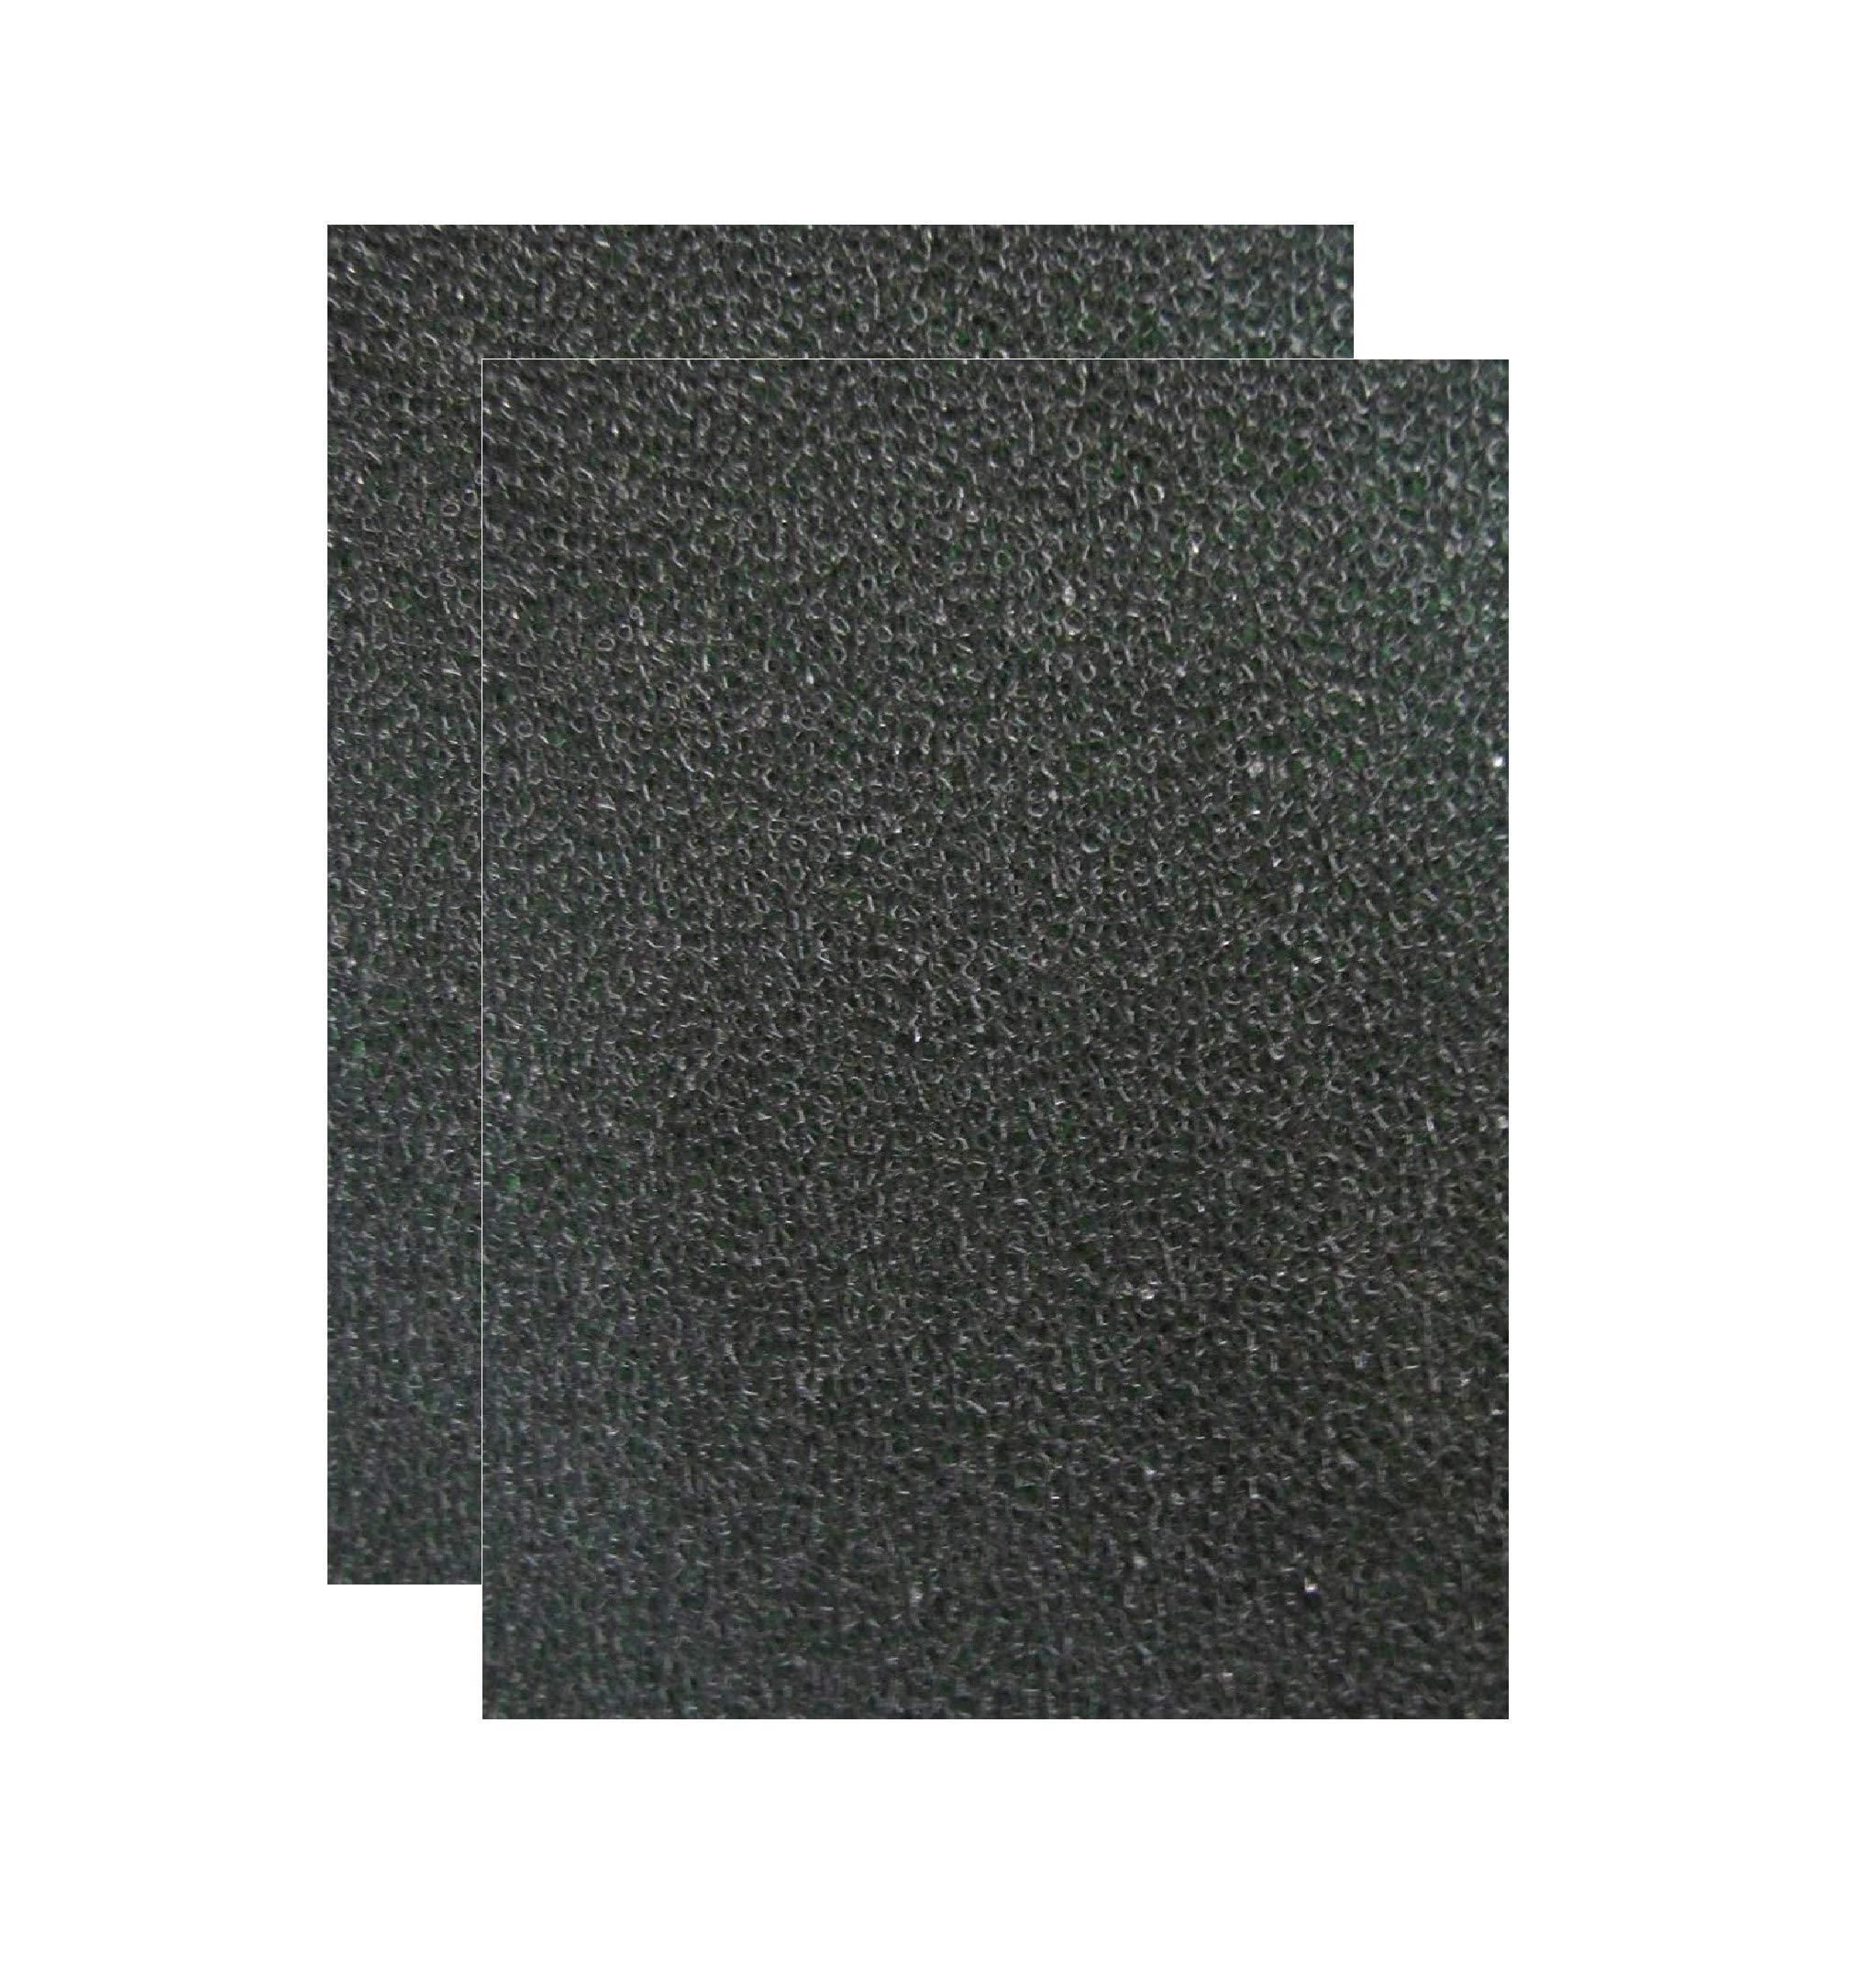 Mobile Home Furnace Foam Door Filter   16 x 26 x 1/4   Compatible with Many Miller, Nordyne, Nortek,